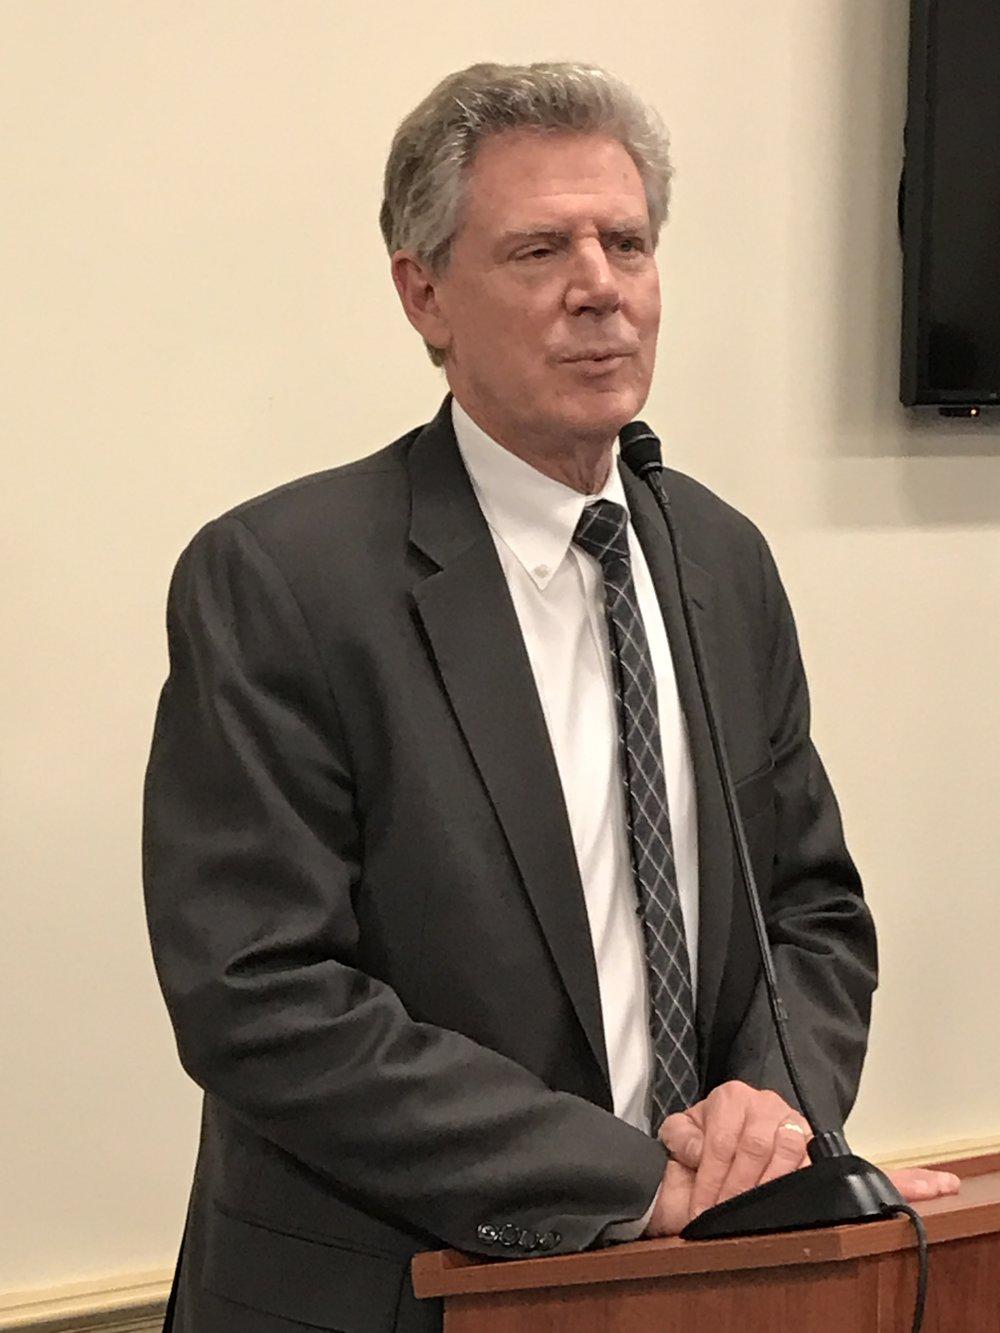 Rep. Frank Pallone (D-NJ)